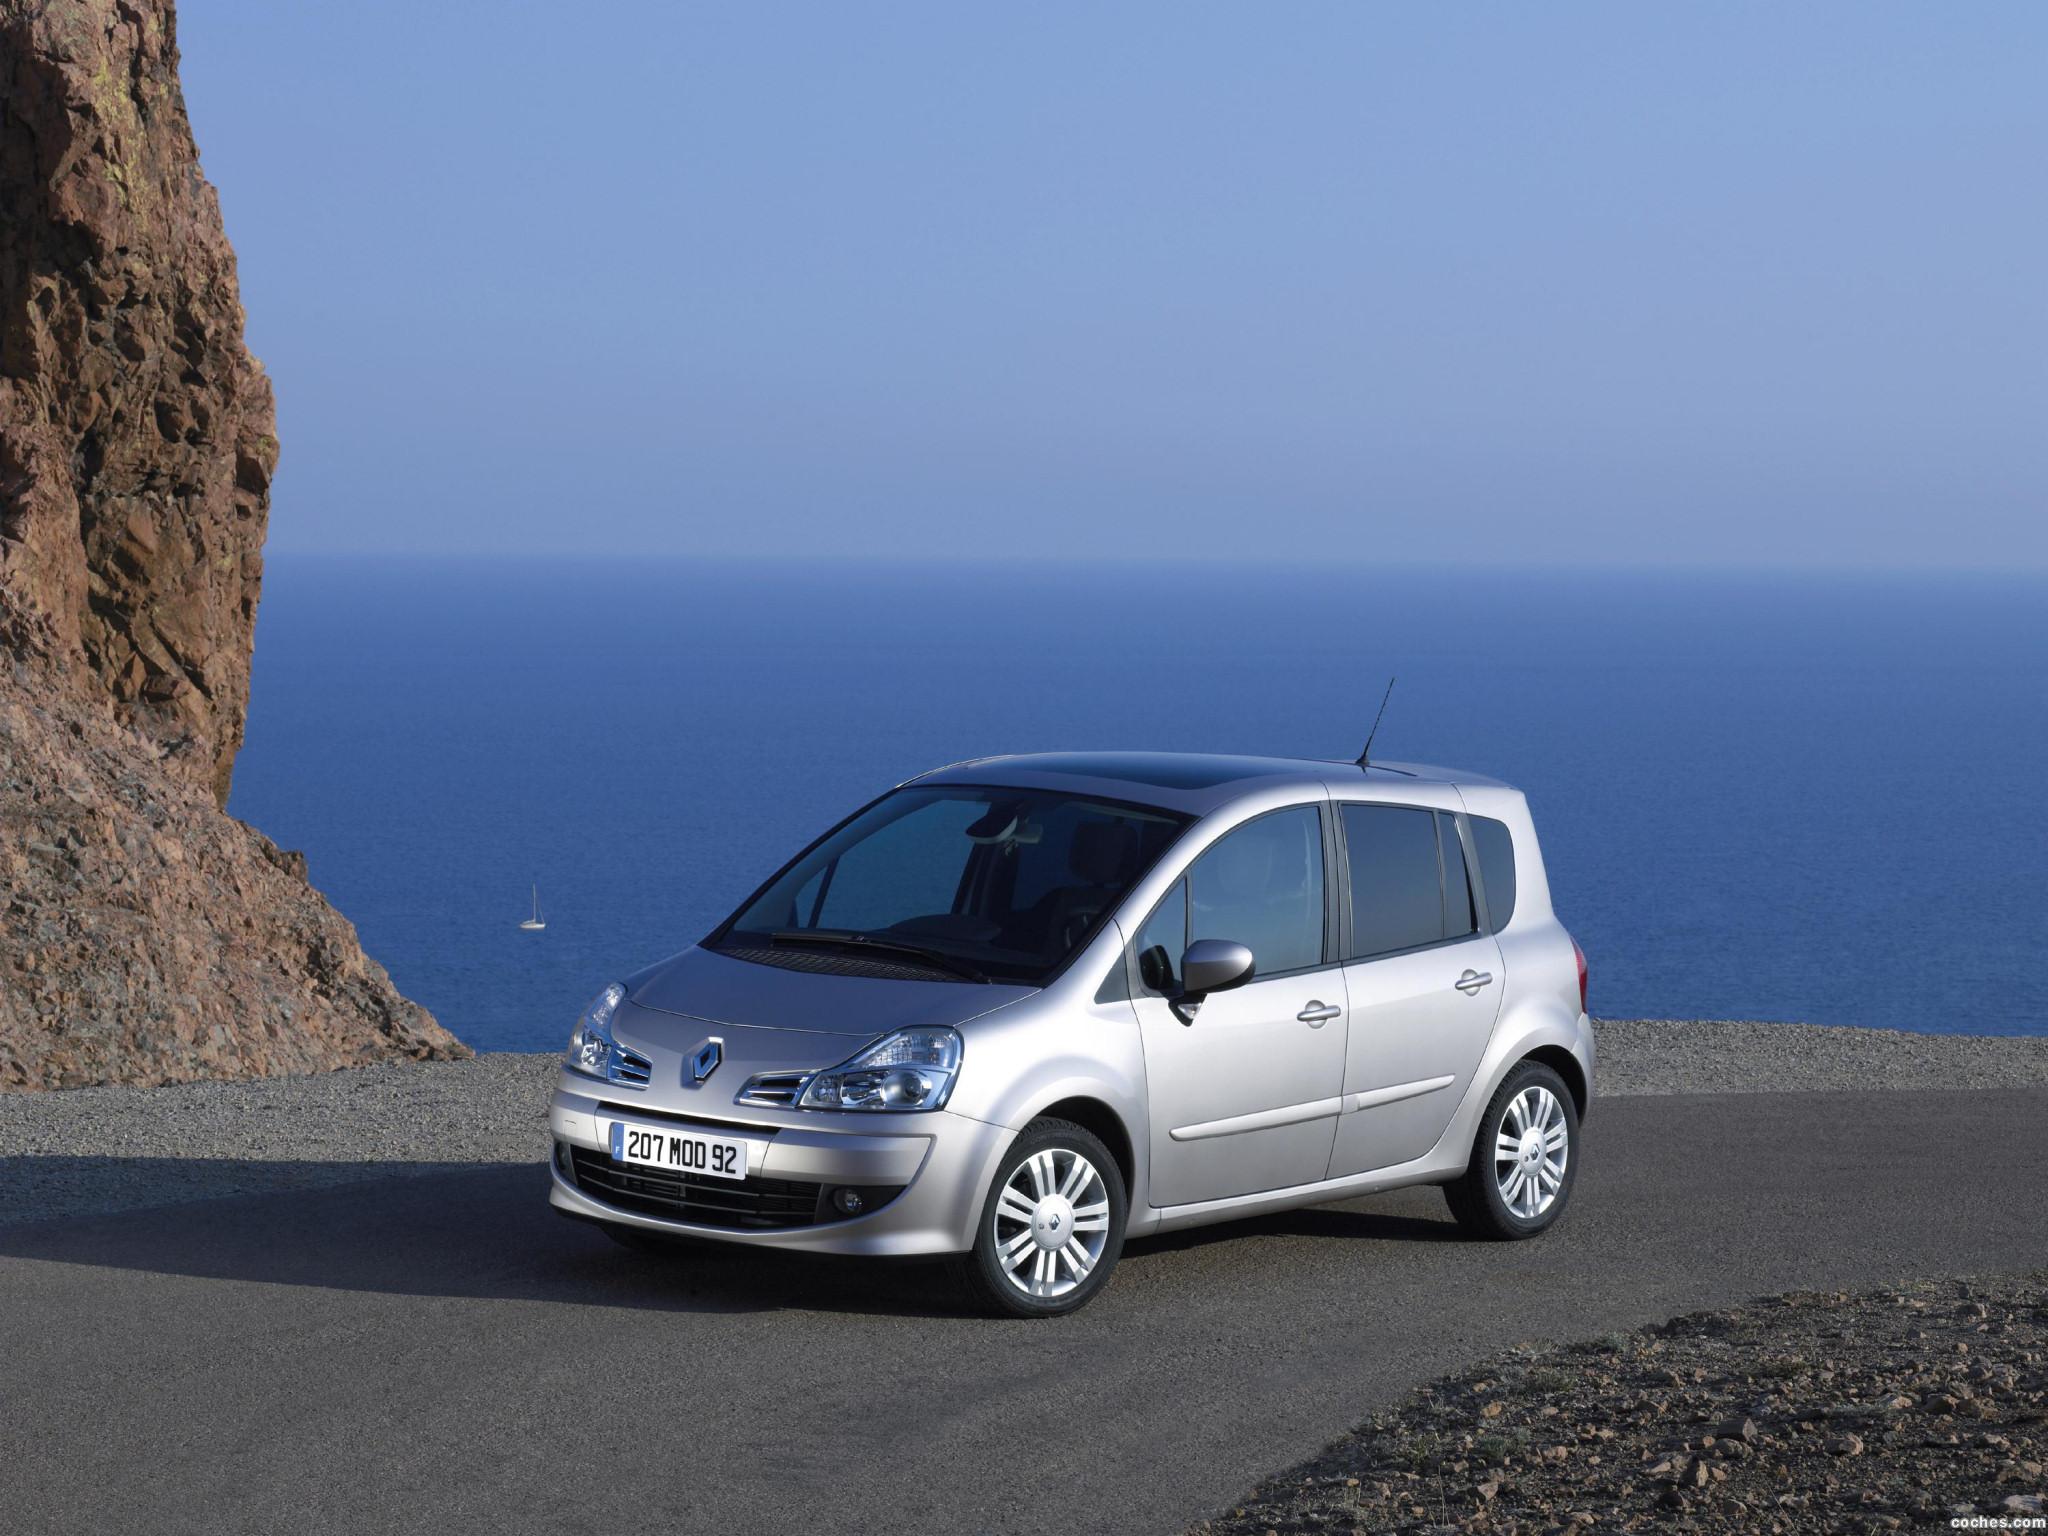 Foto 0 de Renault Grand Modus 2007